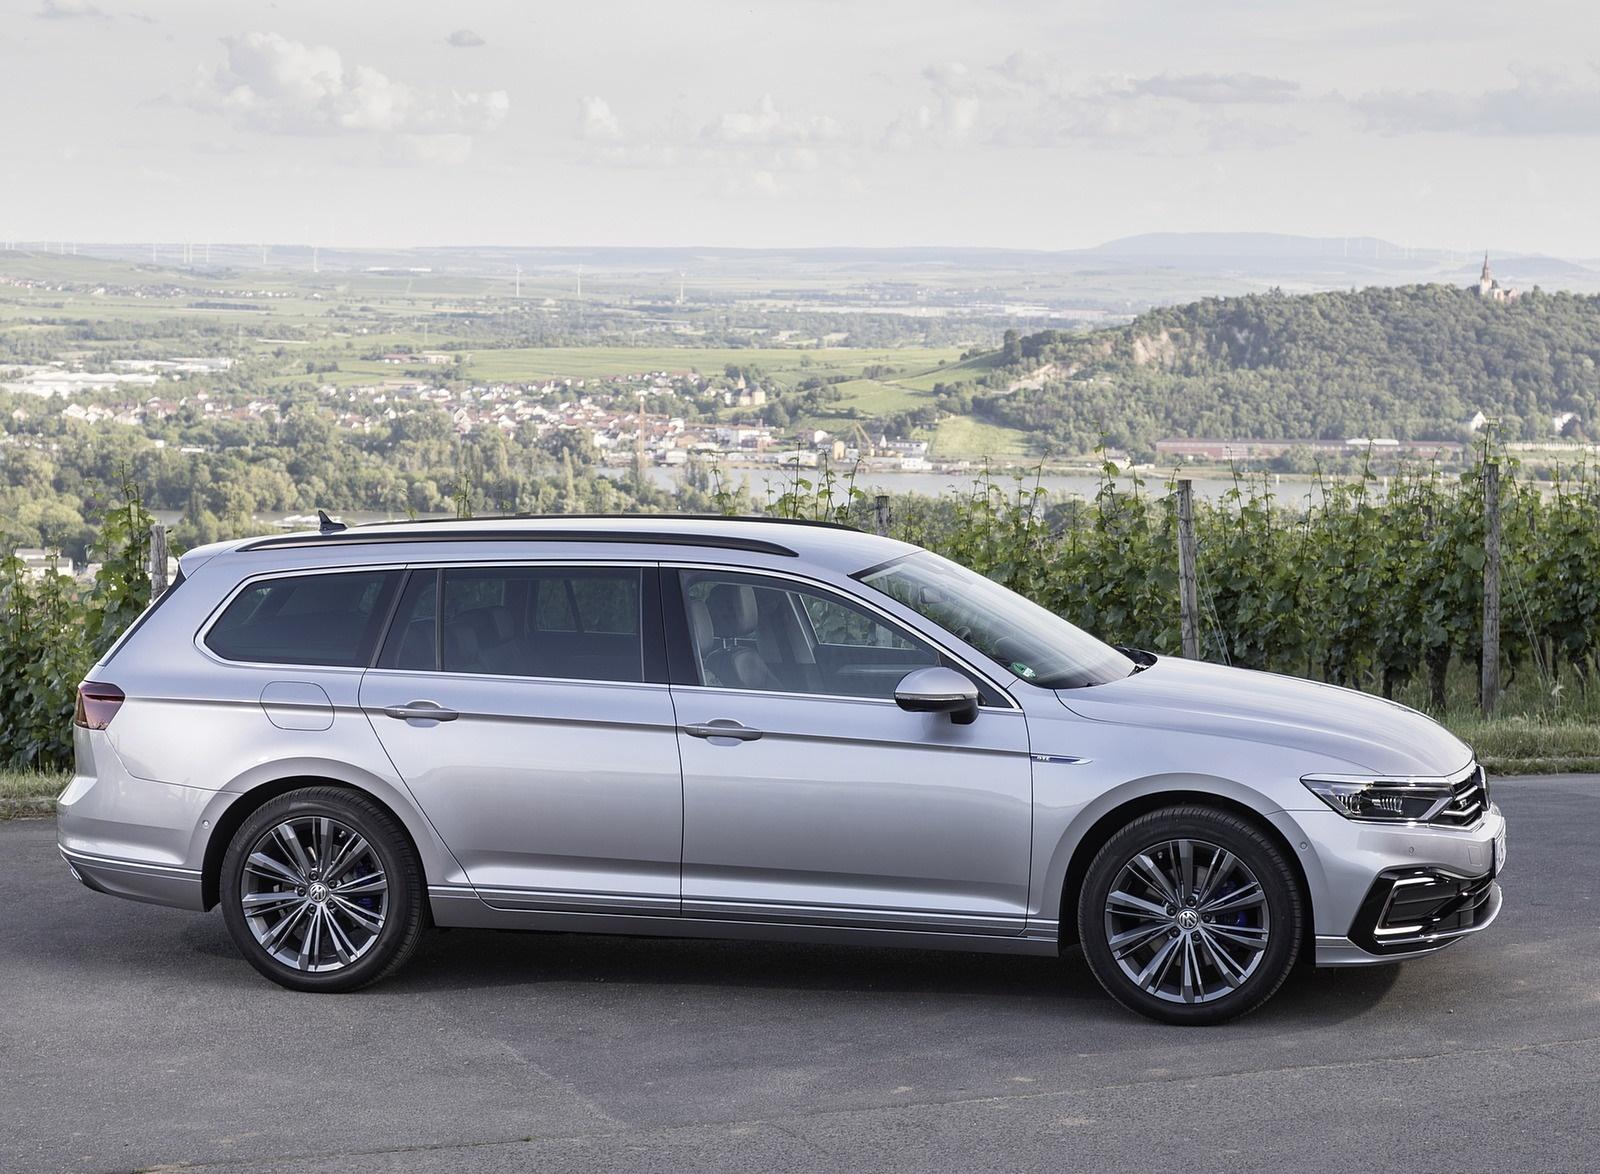 2020 Volkswagen Passat GTE Variant (Plug-In Hybrid EU-Spec) Side Wallpapers (14)